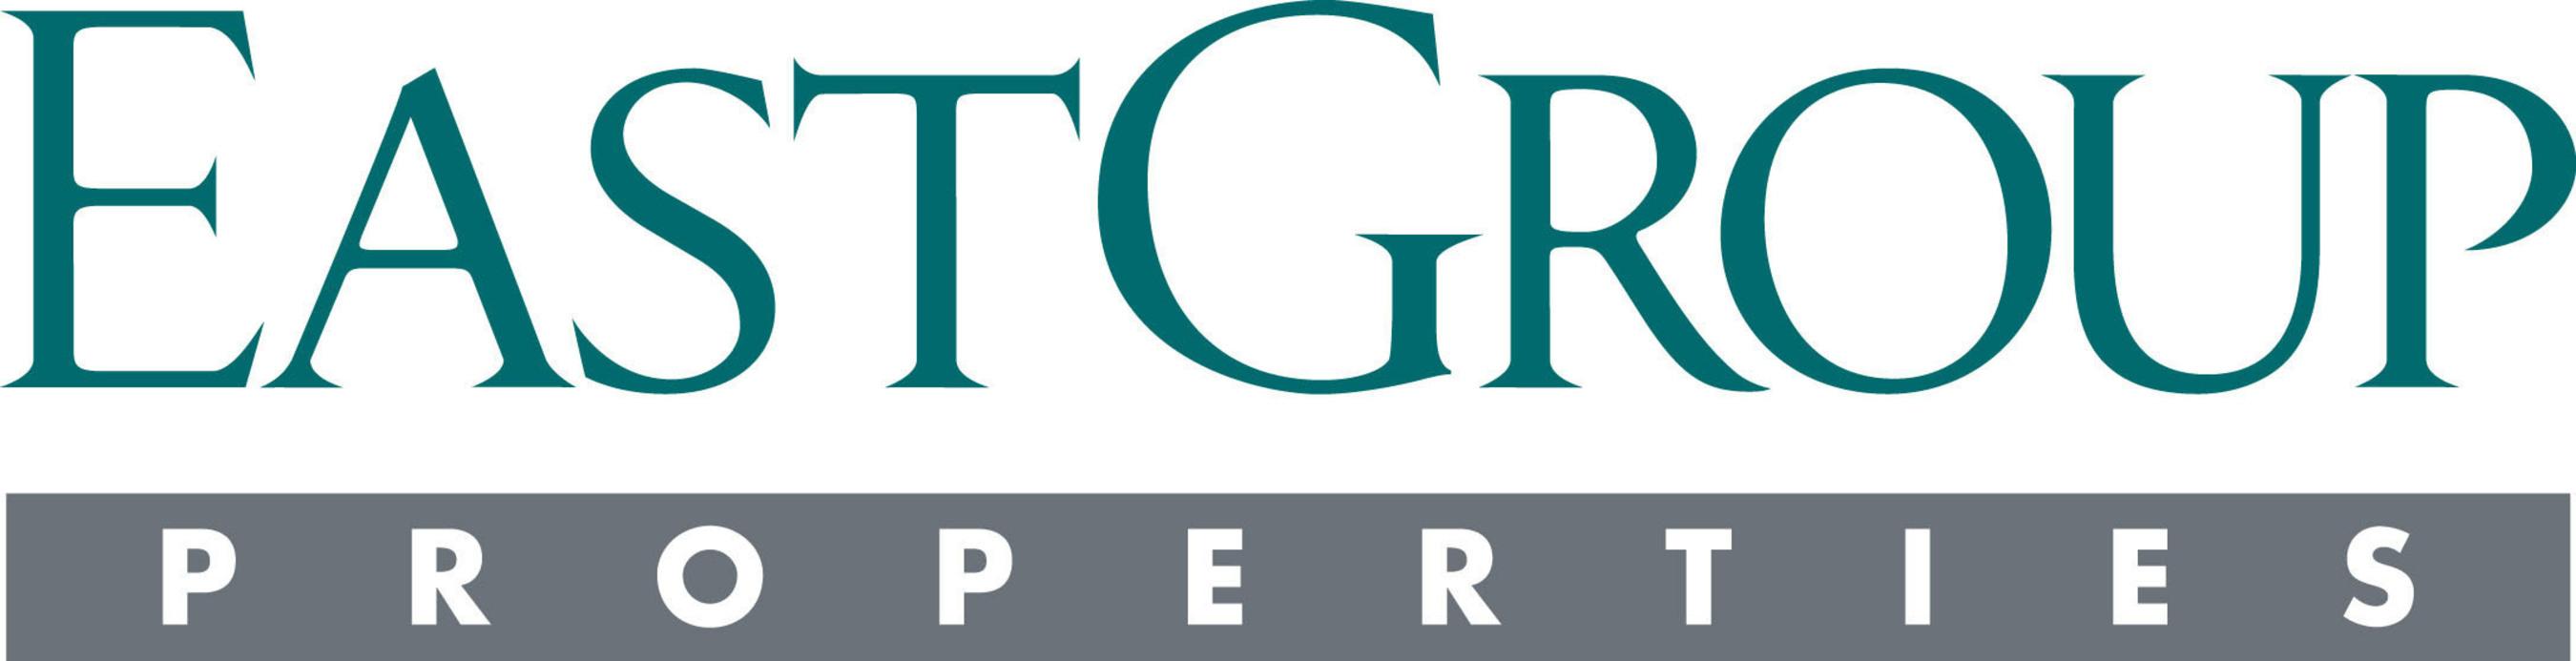 EastGroup Properties, Inc. logo. (PRNewsFoto/EAST GROUP PROPERTIES, INC.) (PRNewsFoto/)